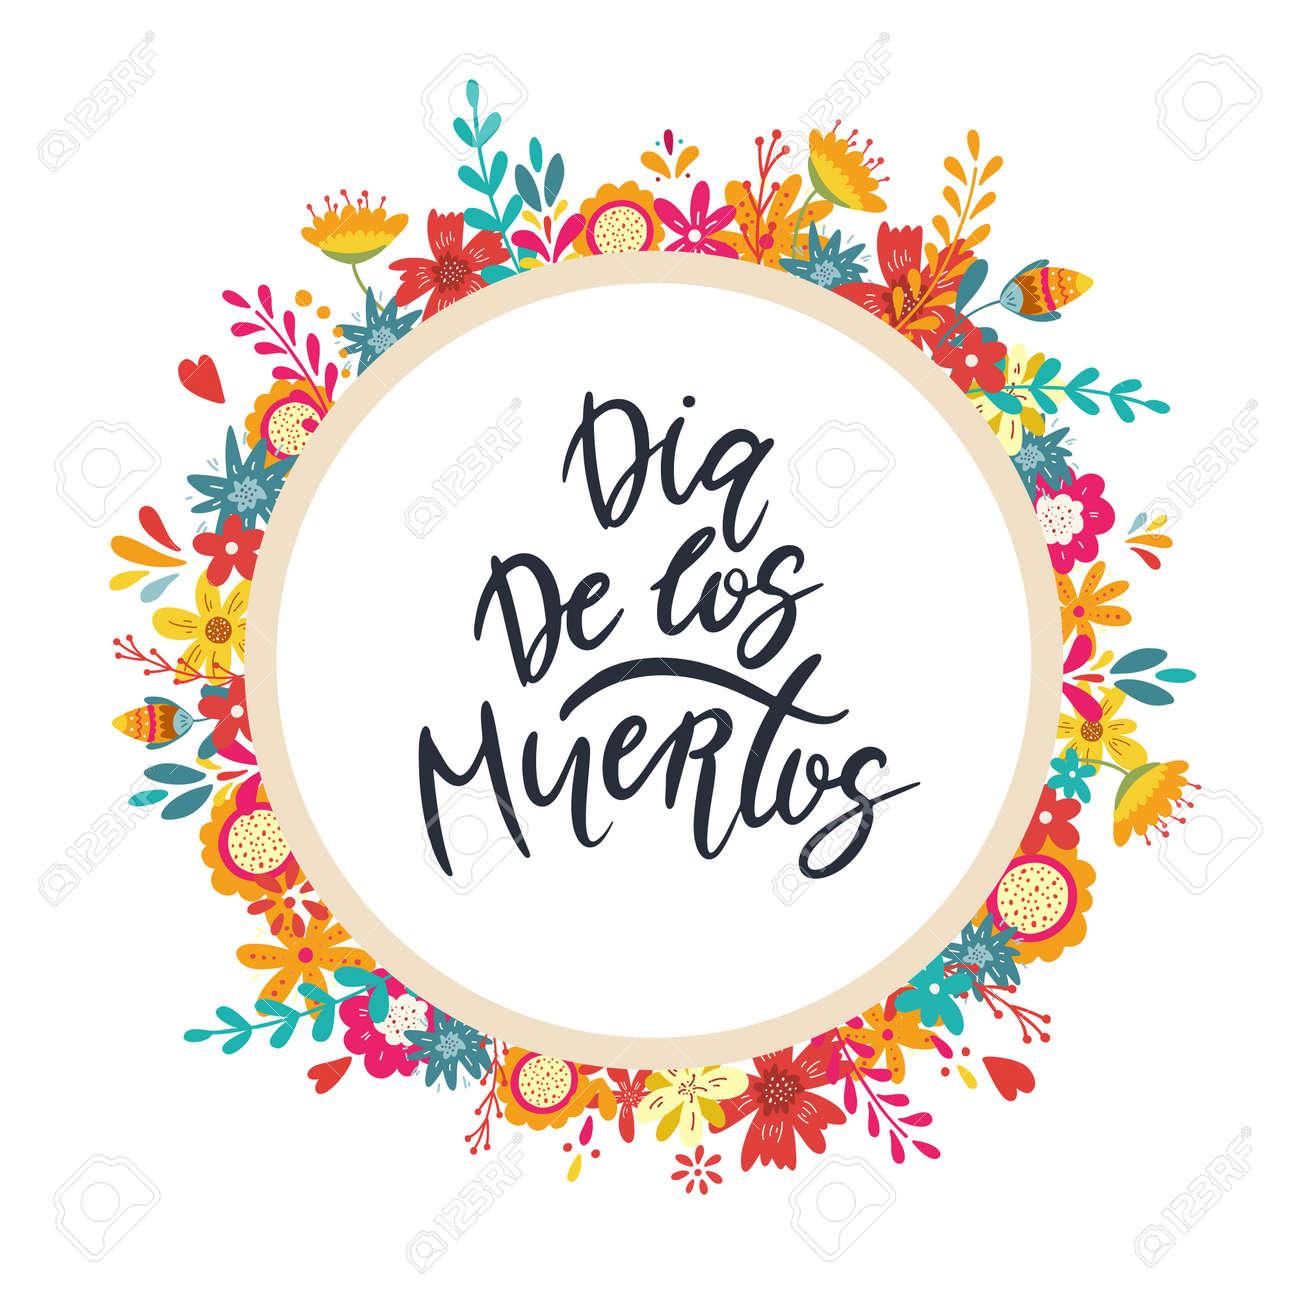 Dia de los muertos, Day of the dead, Mexican holiday banner, card - 132261176